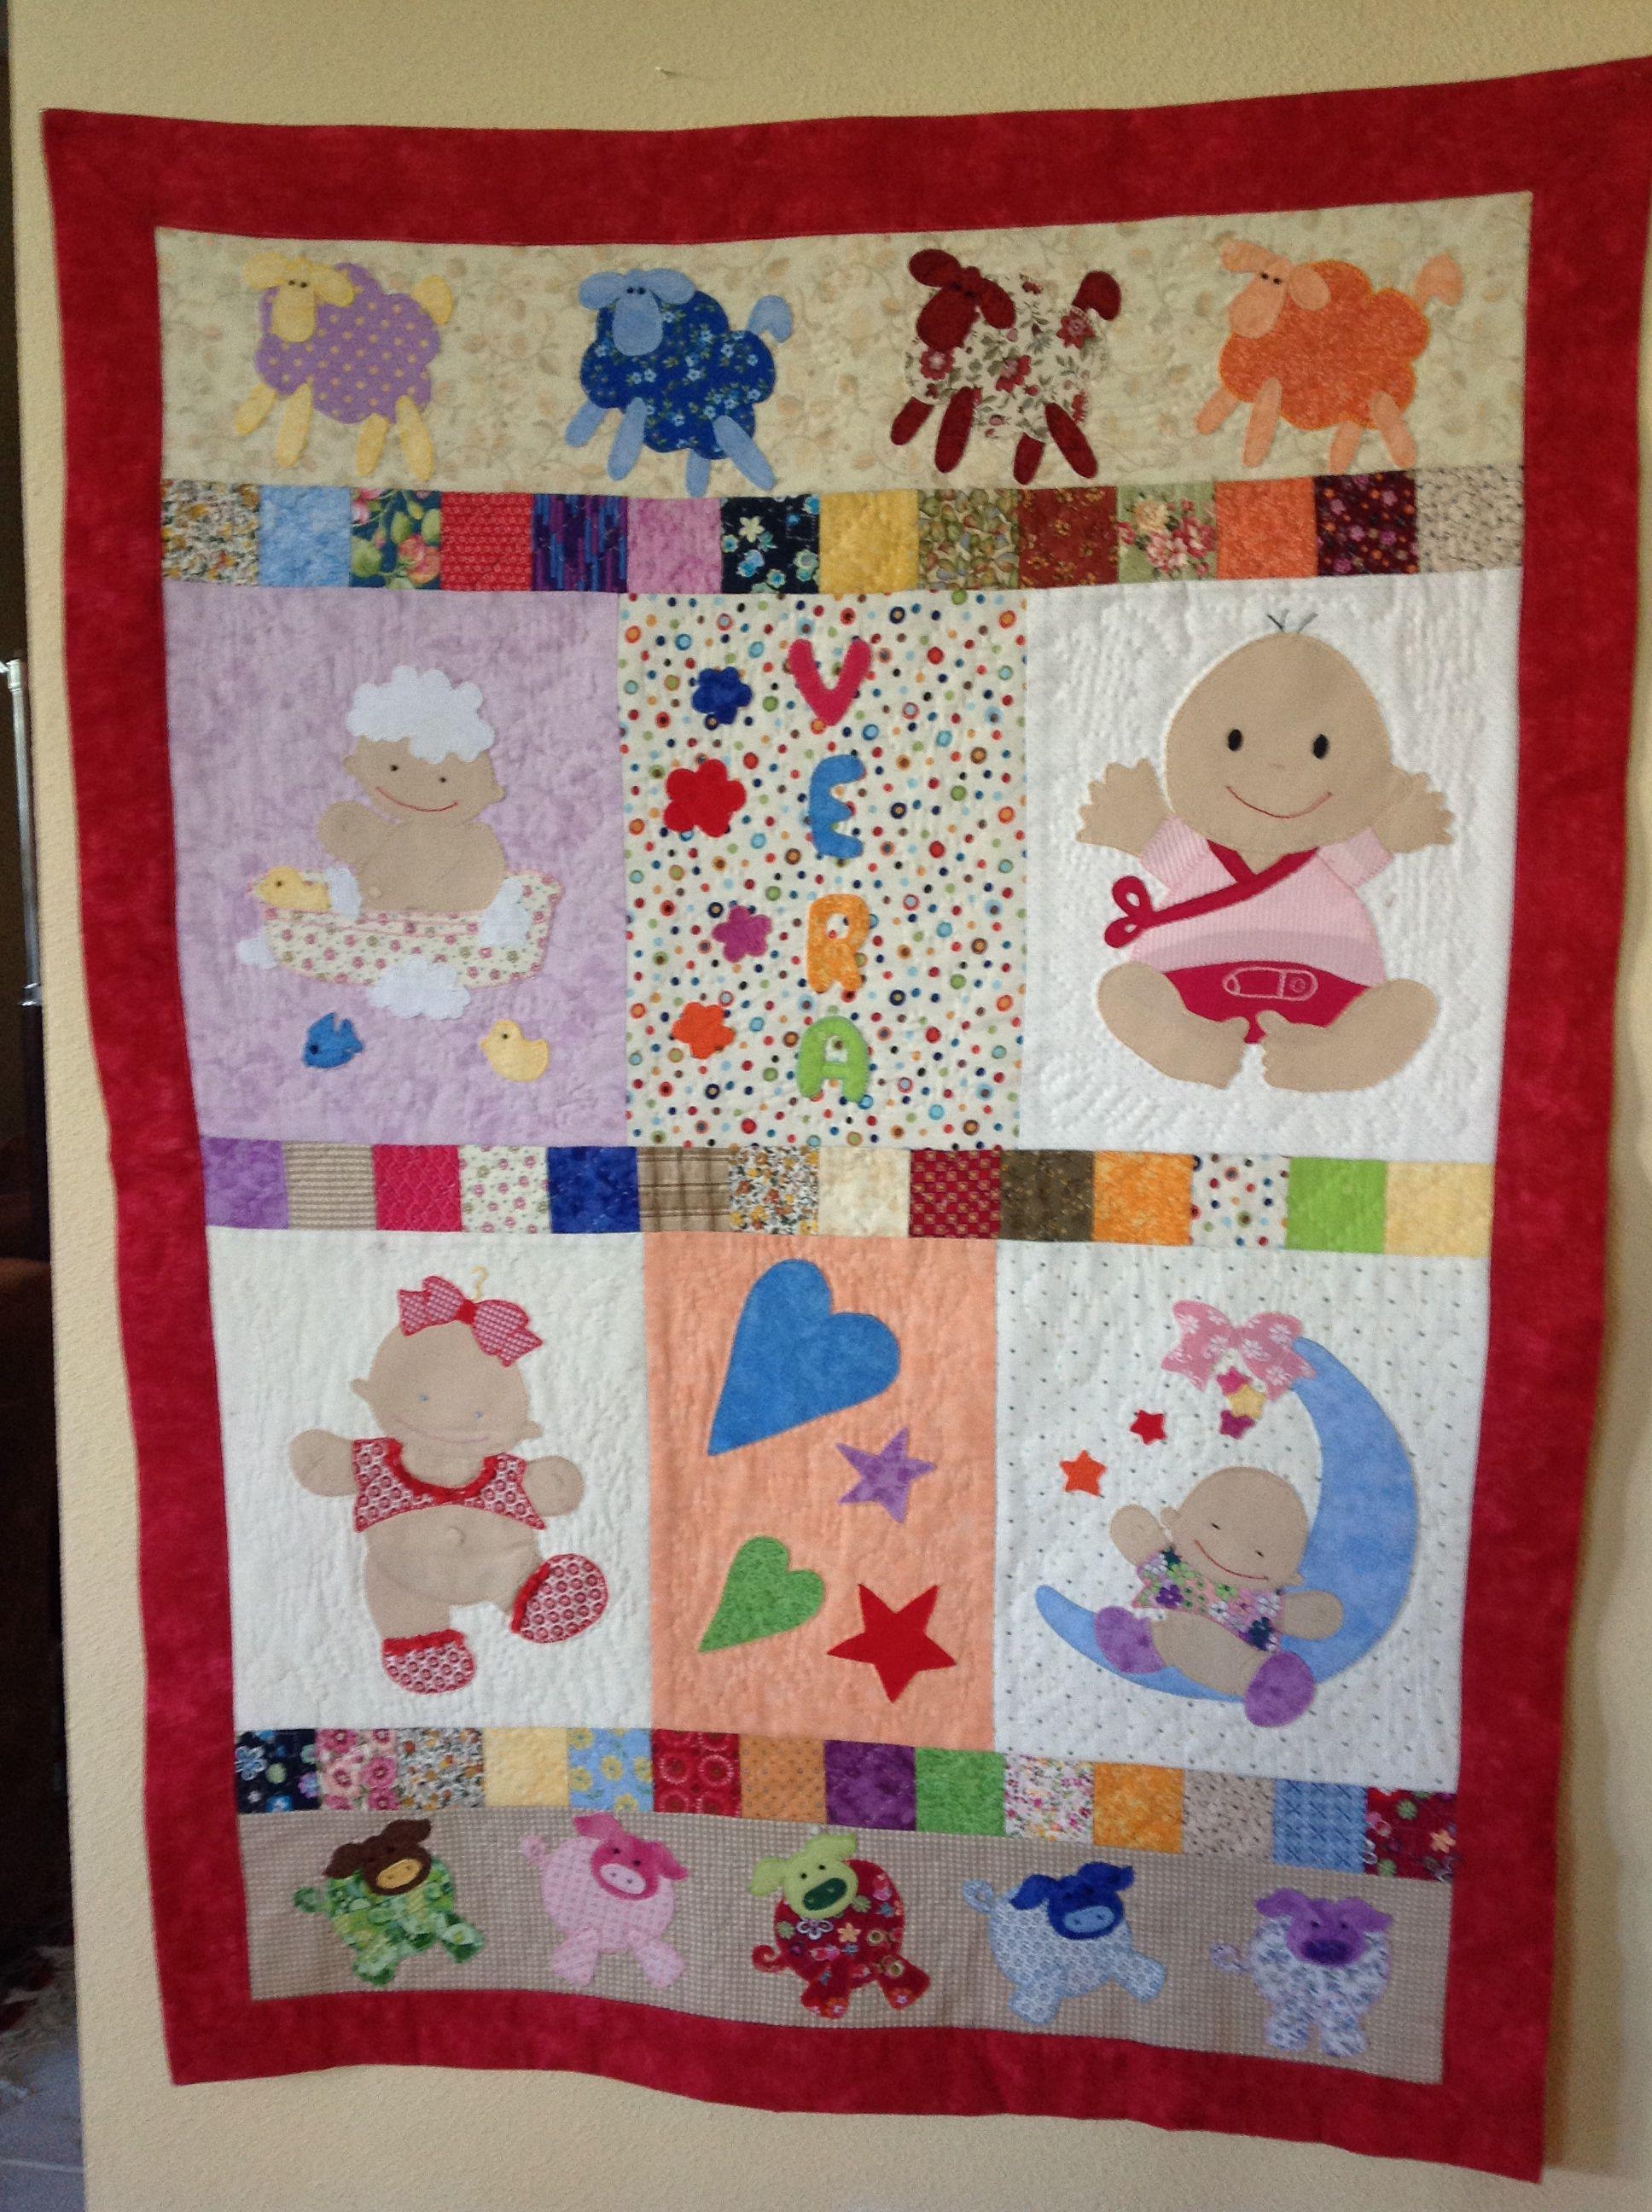 Colcha bebe patchwork bebek battaniyesi pinterest - Colchas patchwork infantiles ...